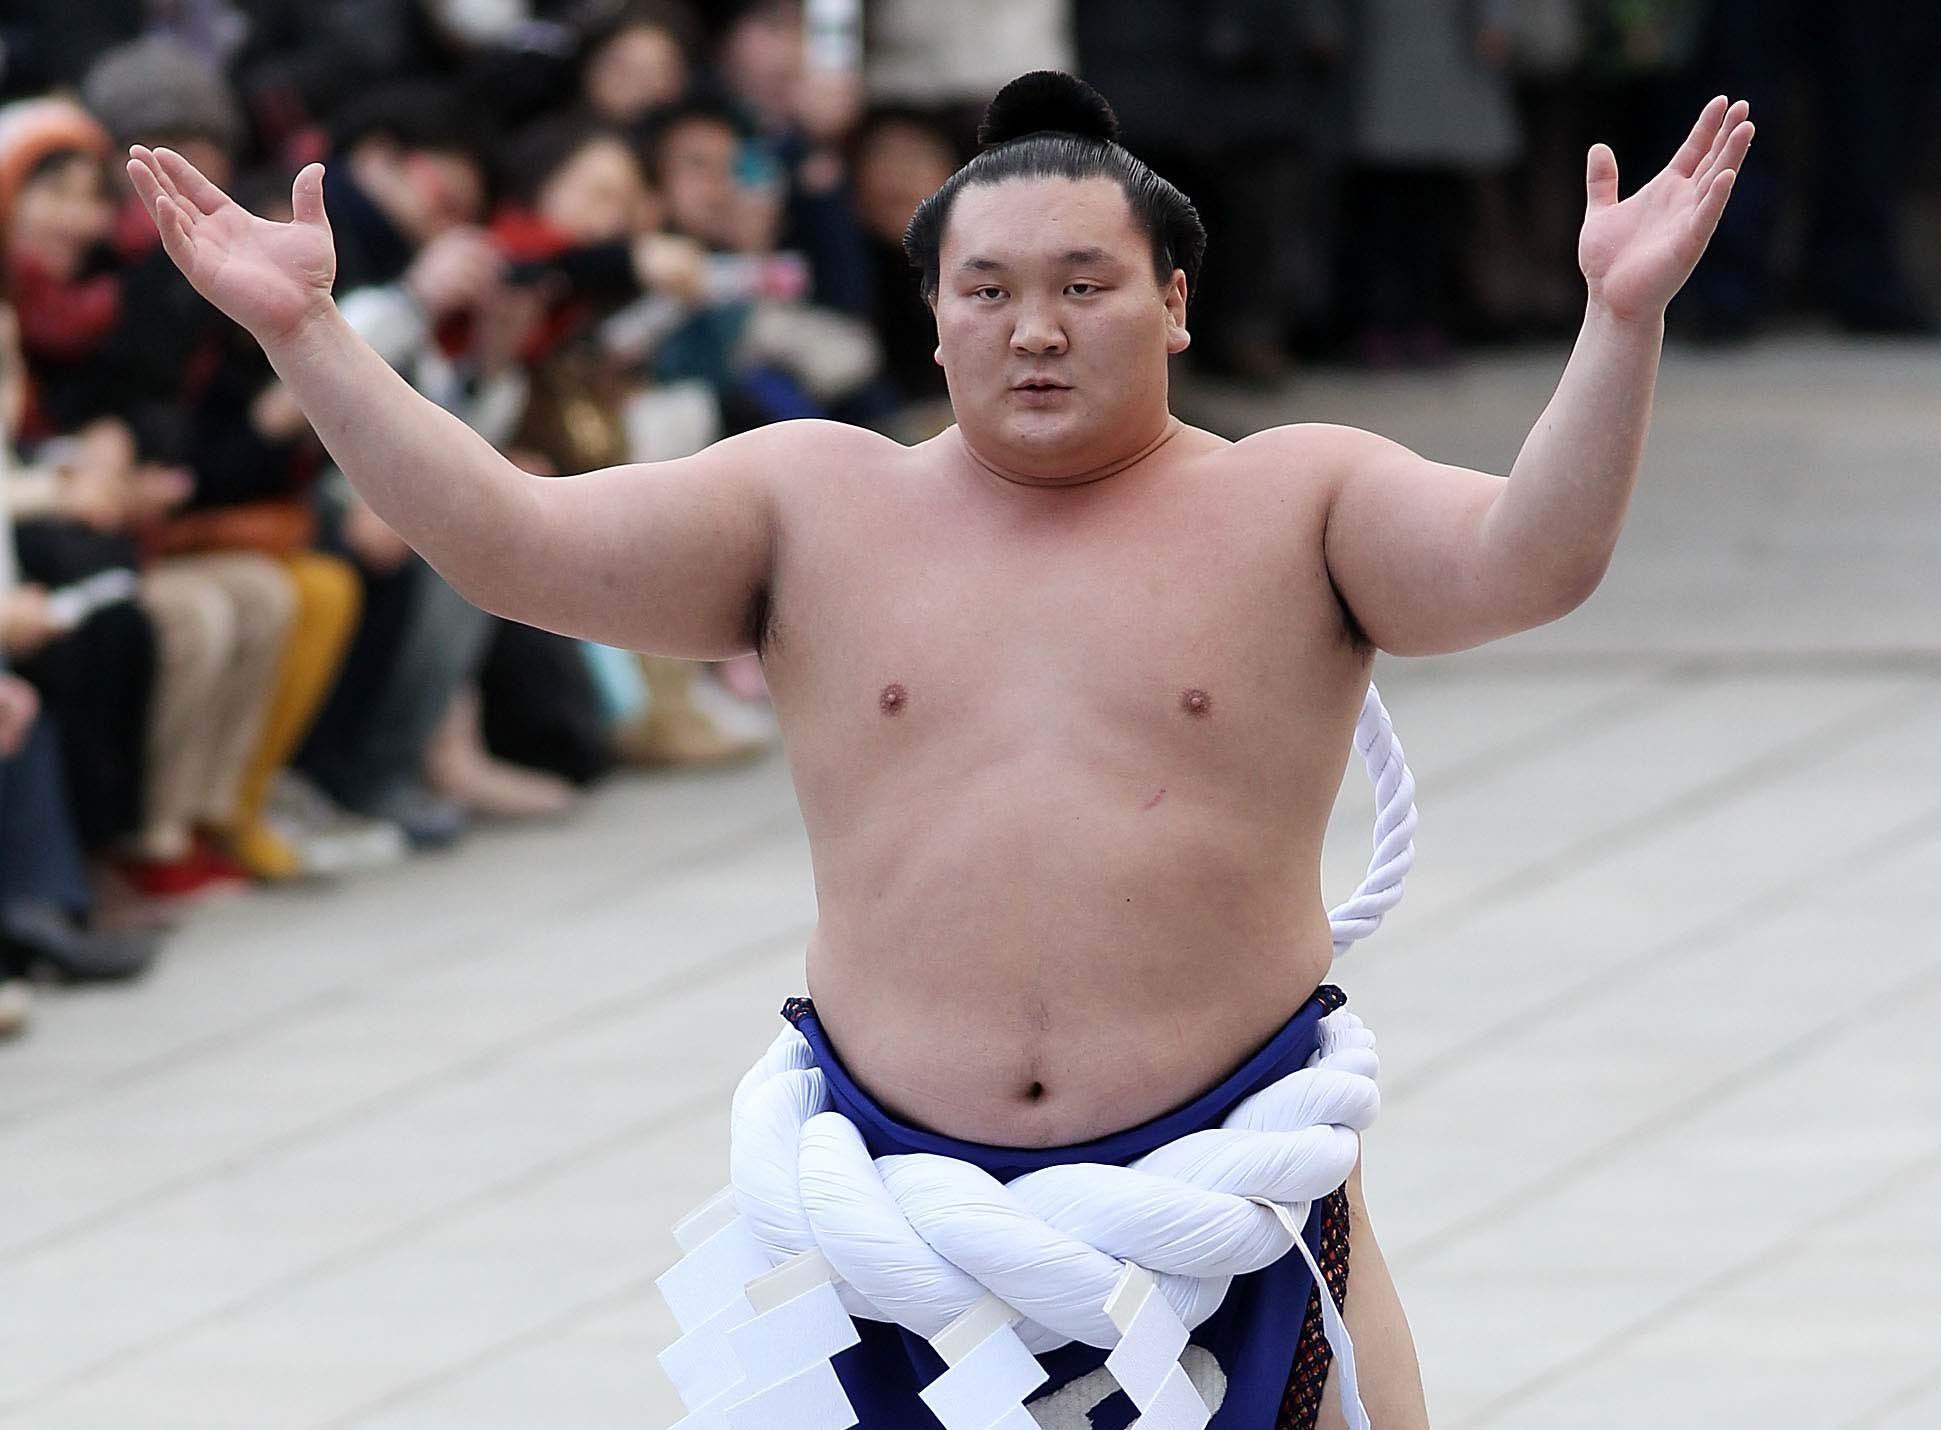 A Sumo Wrestling Match